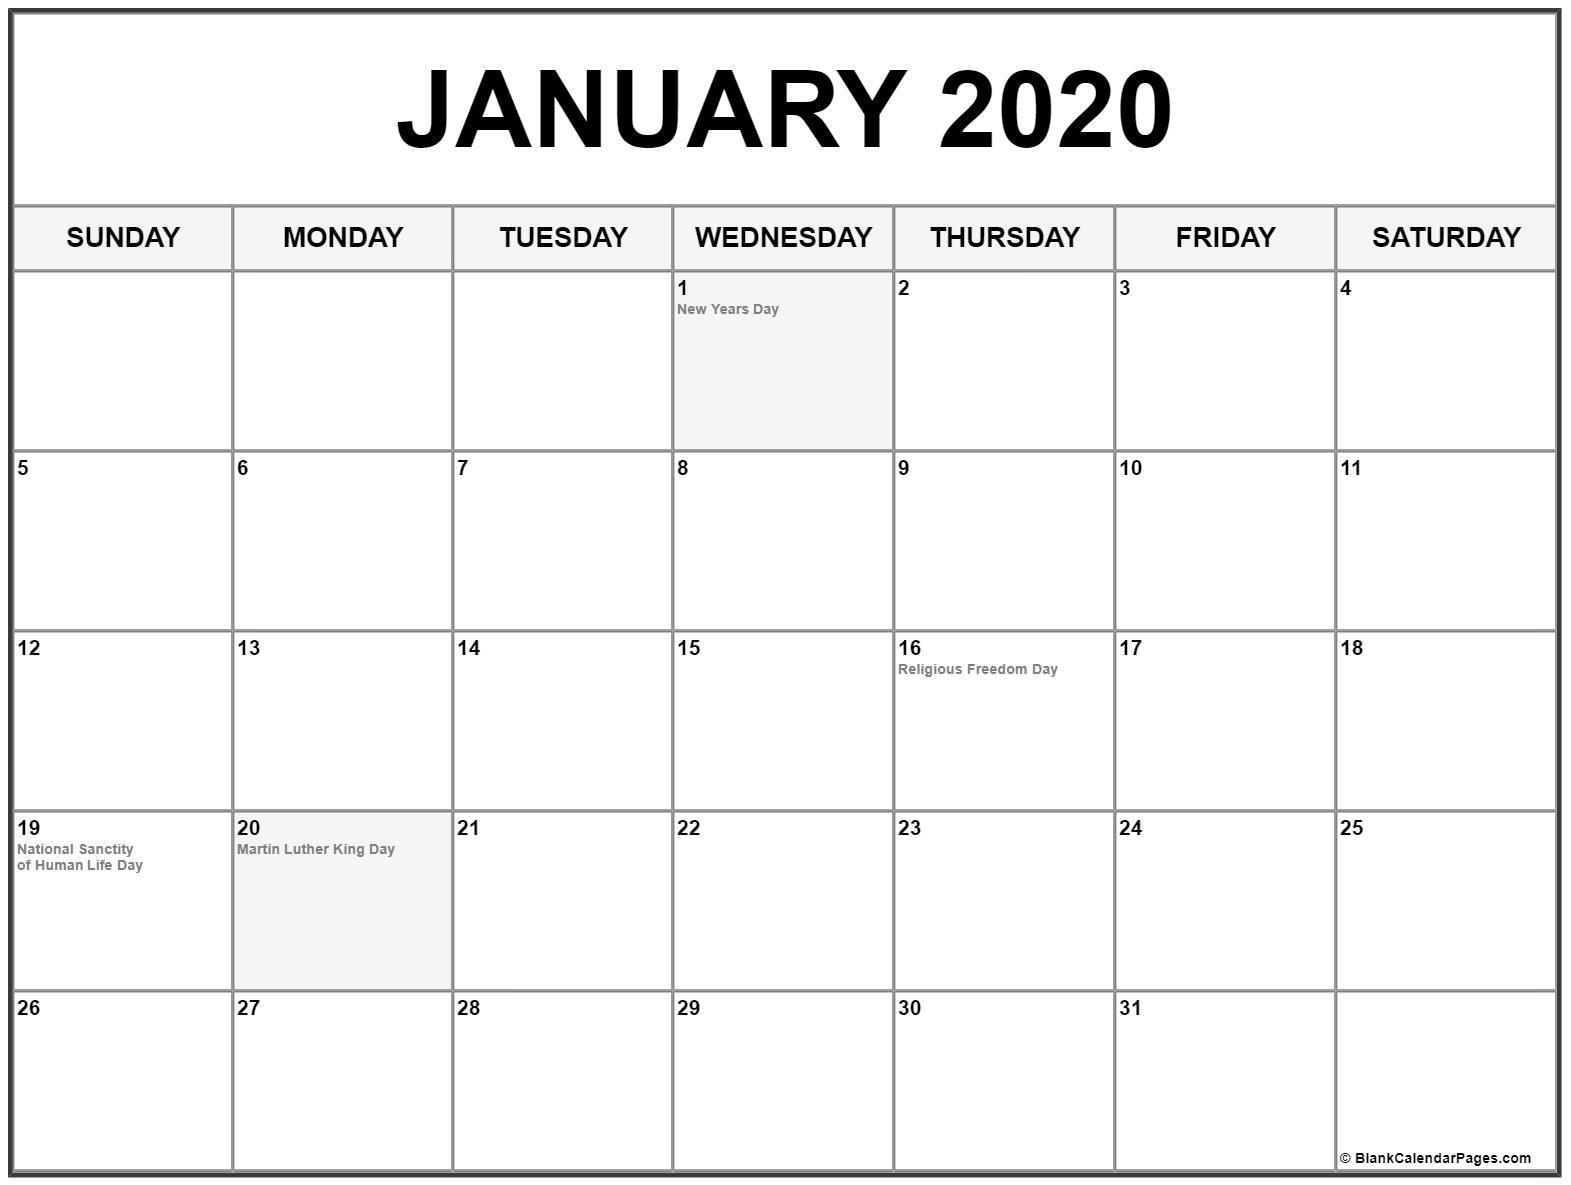 Impressive Calendar With Holidays 2020 • Printable Blank-2020 Jewish Holidays Printable Calendar